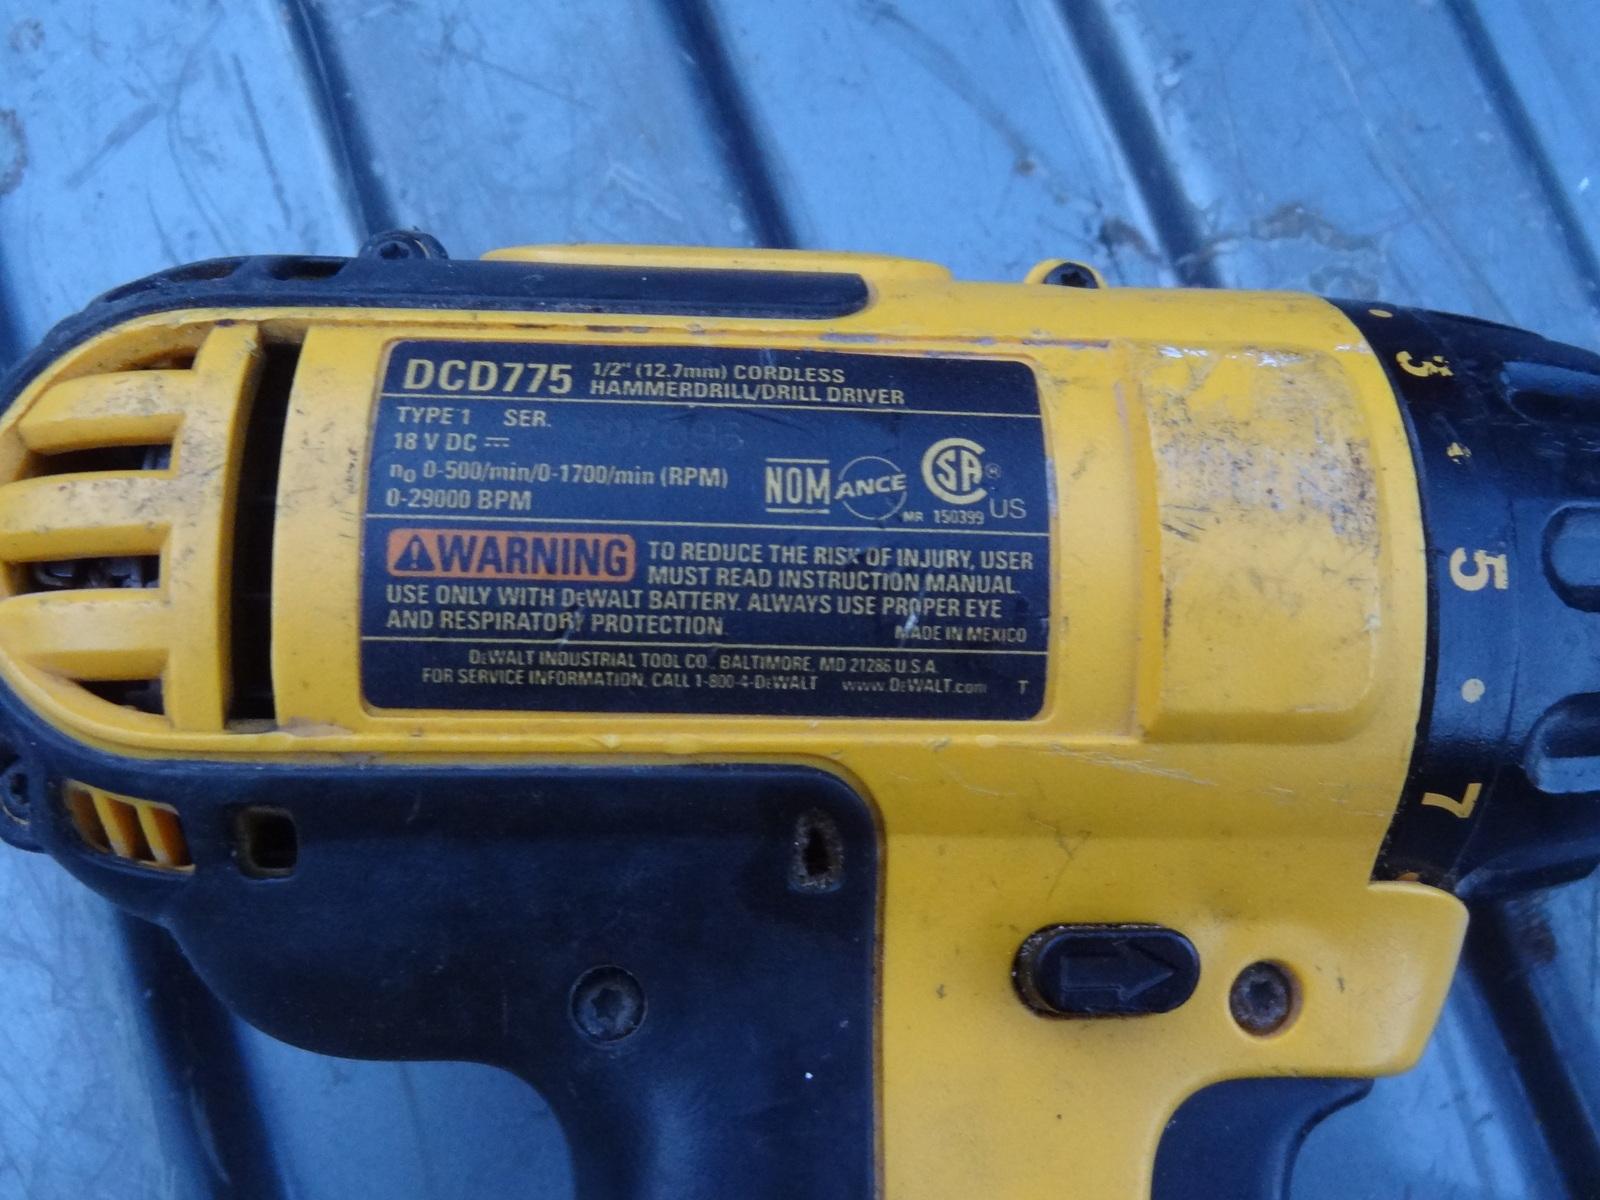 Dewalt DCD775 1//2 Cordless Hammer Drill Type 1 18V DC Housing